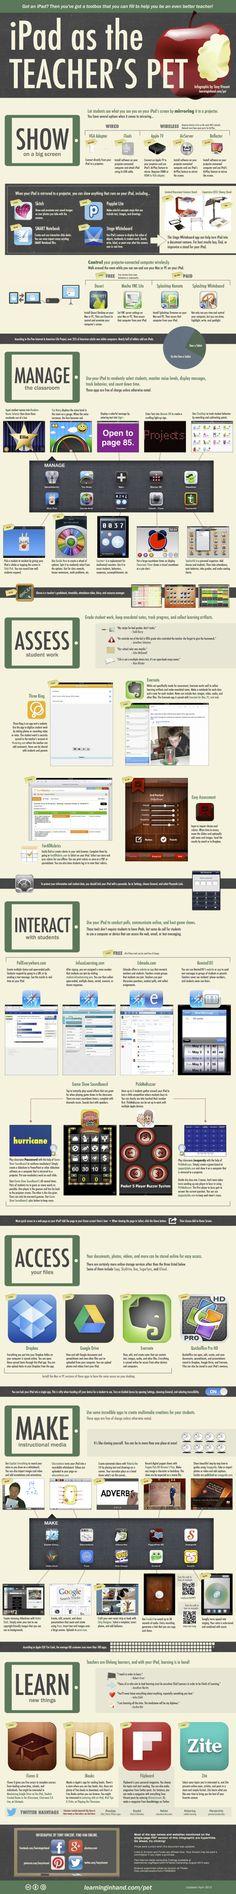 iPad as Teachers Pet